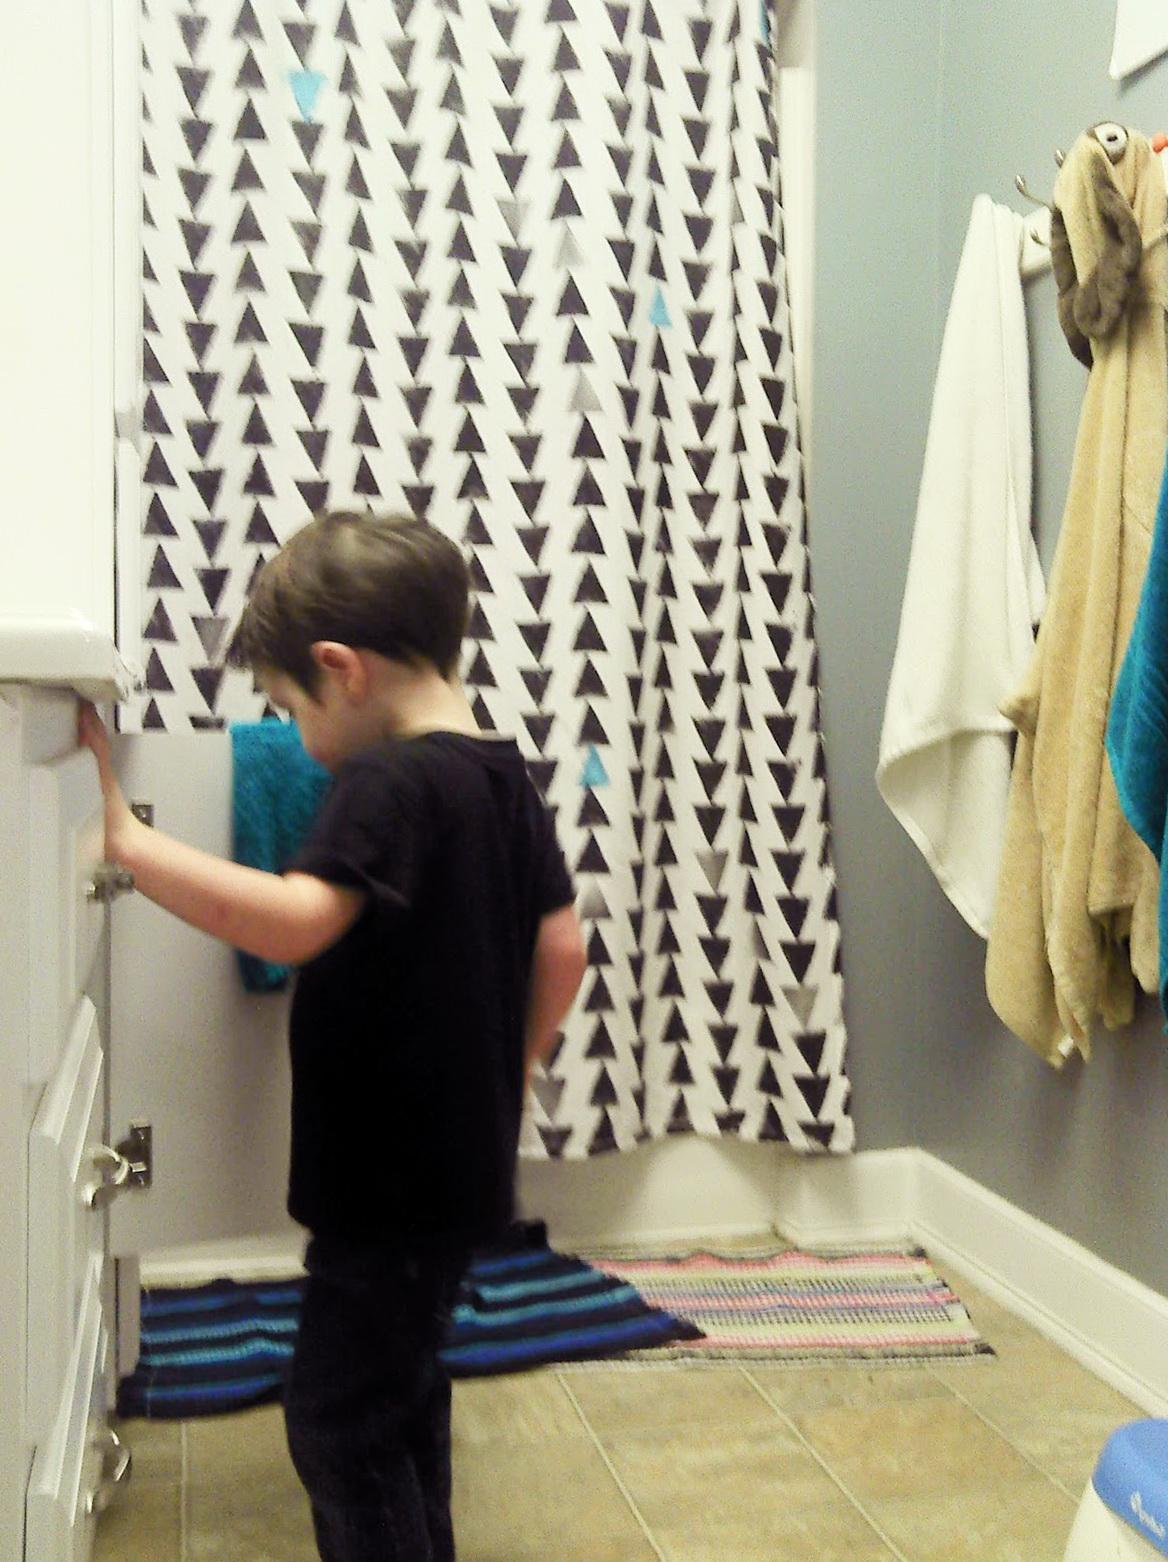 Urban shower curtains